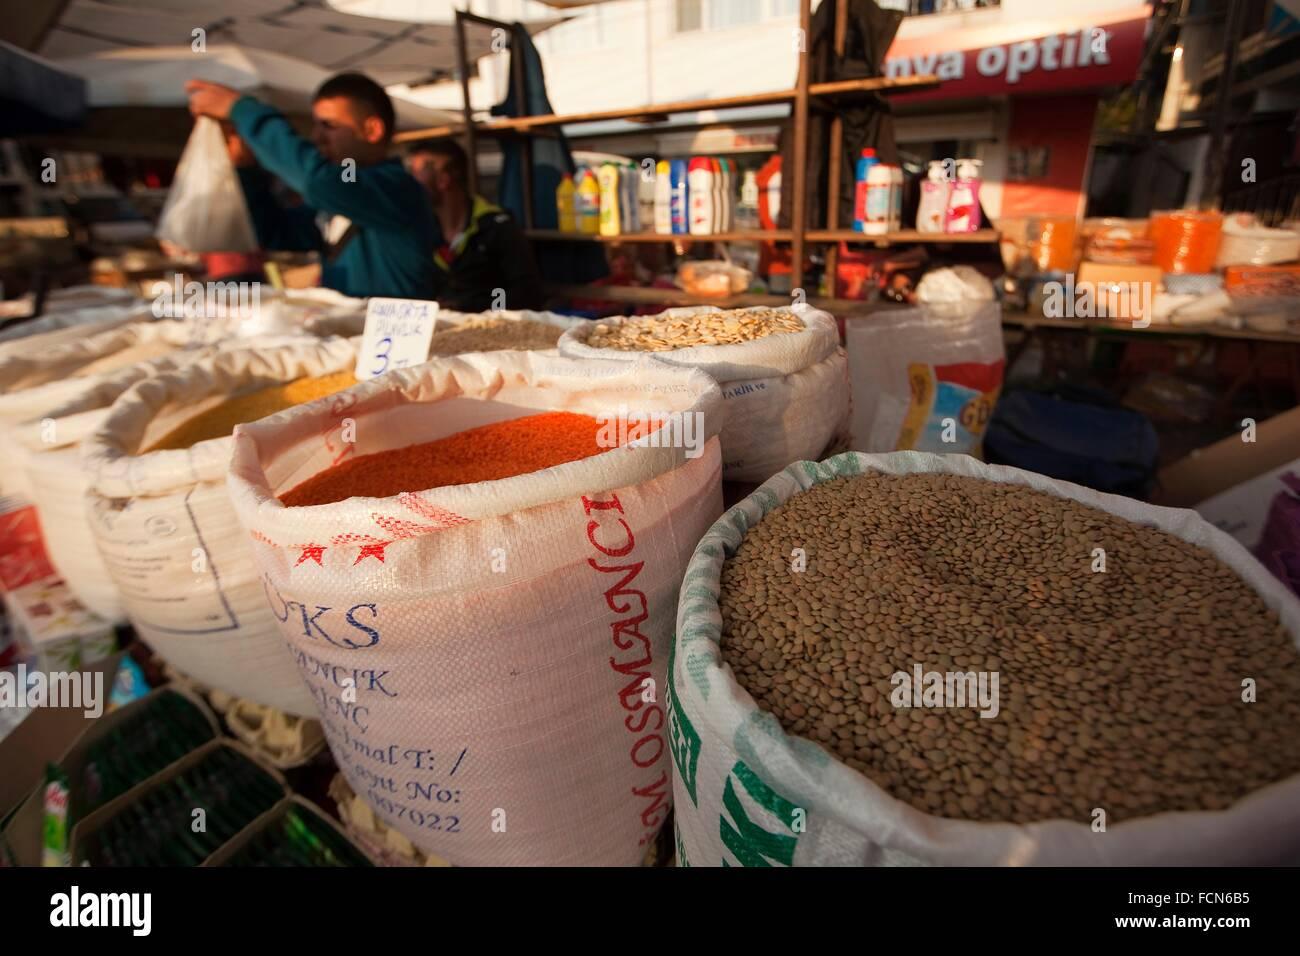 Different legumes in sacks at the market, Selcuk, Izmir, Aegean Coast, Turkey, Europe. - Stock Image